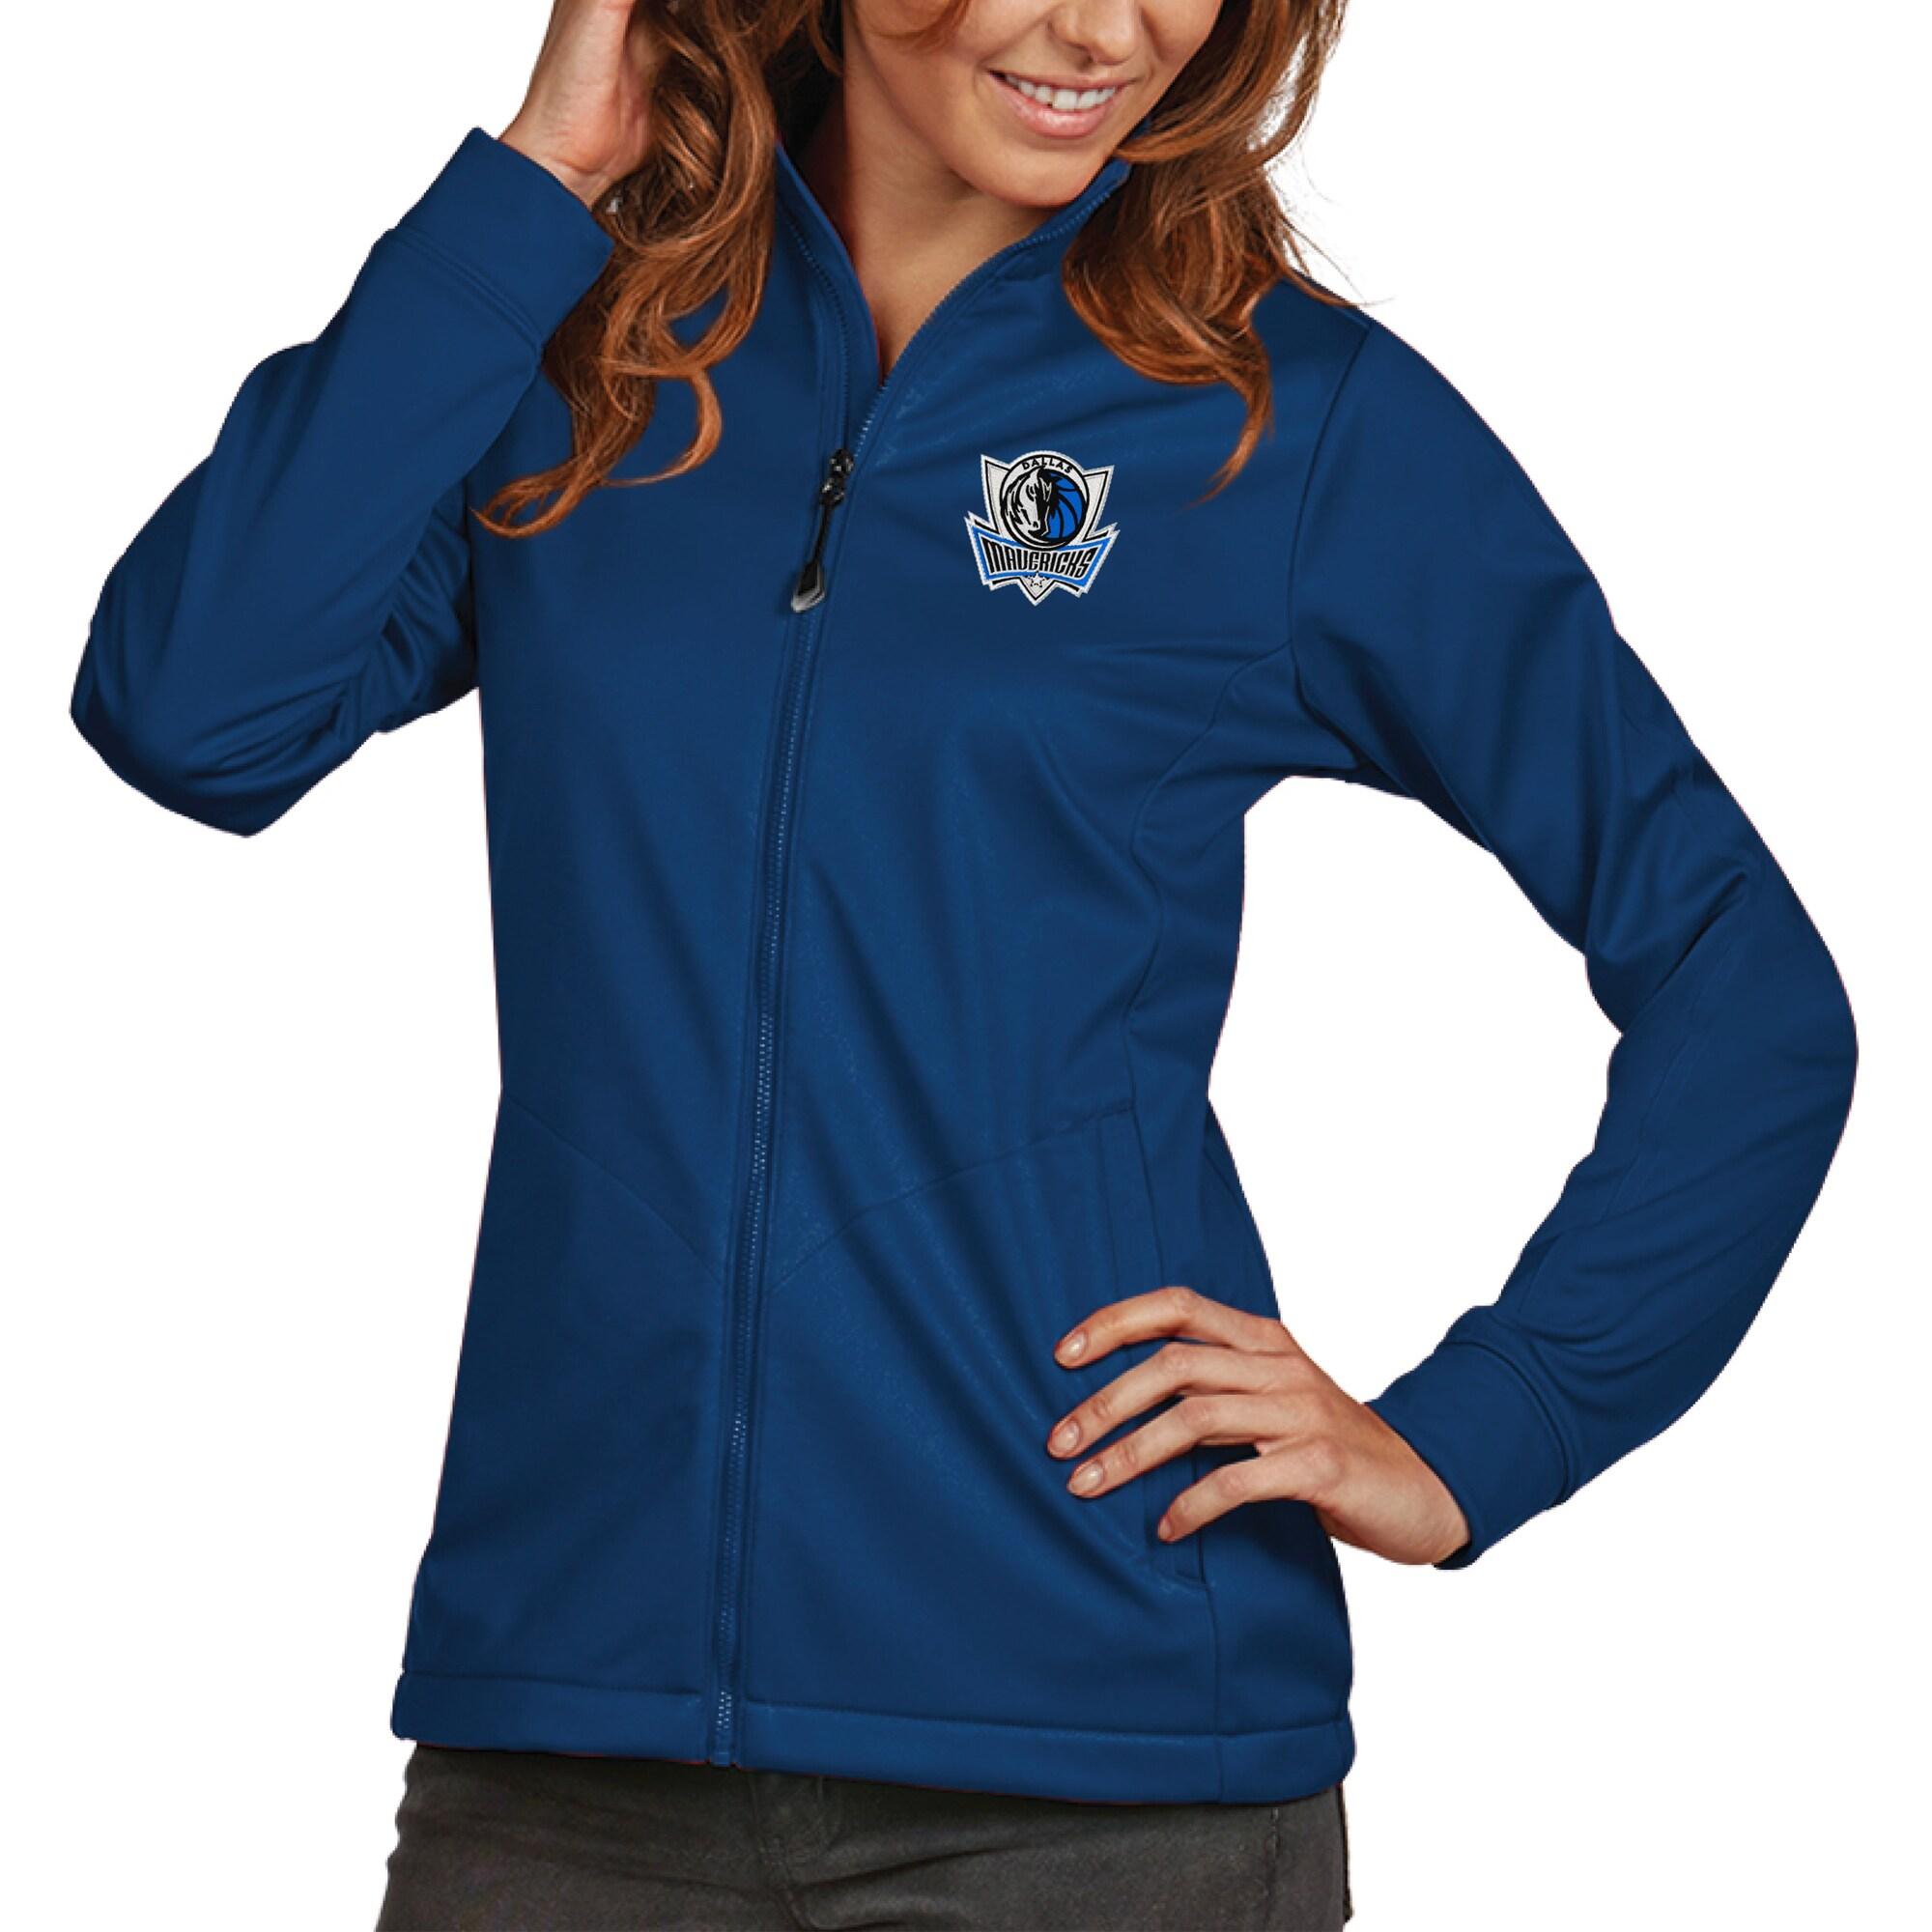 Dallas Mavericks Antigua Women's Golf Full-Zip Jacket - Royal